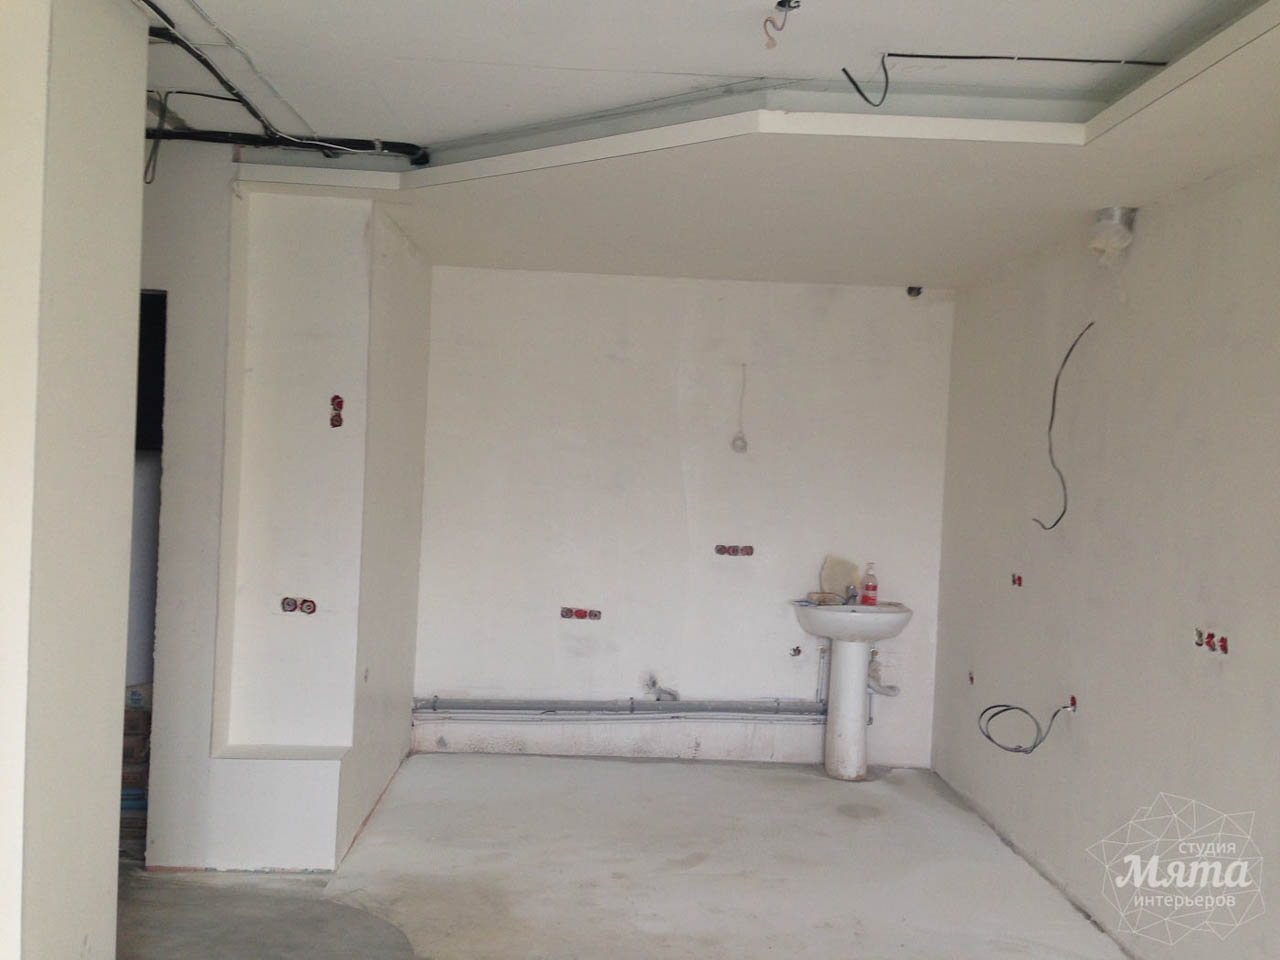 Дизайн интерьера и ремонт трехкомнатной квартиры по ул. Фучика 9 24